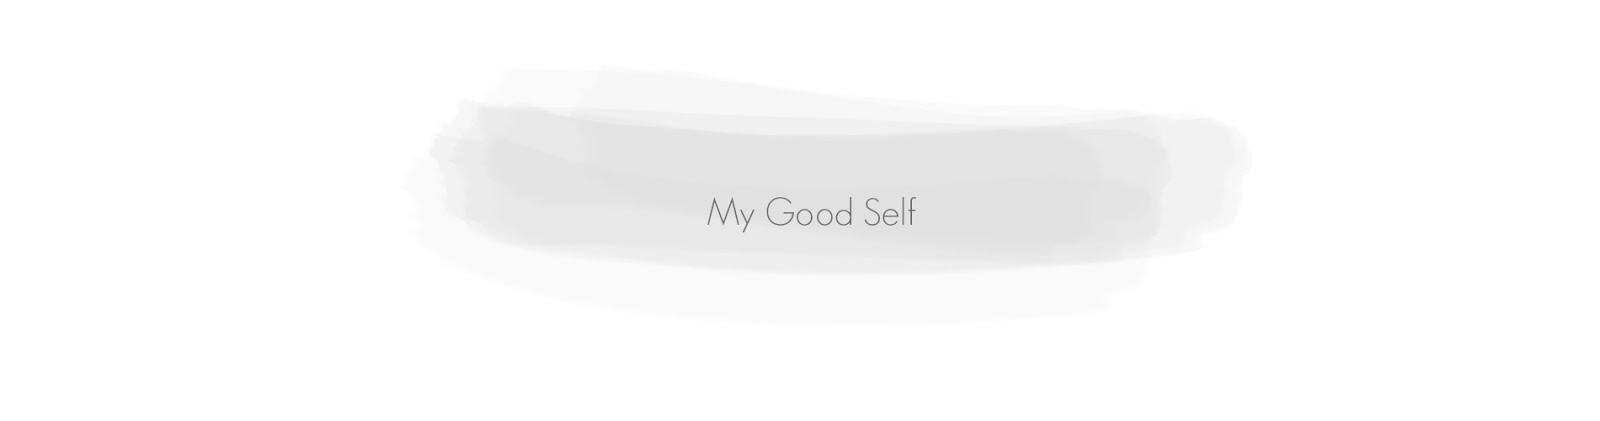 My Good Self